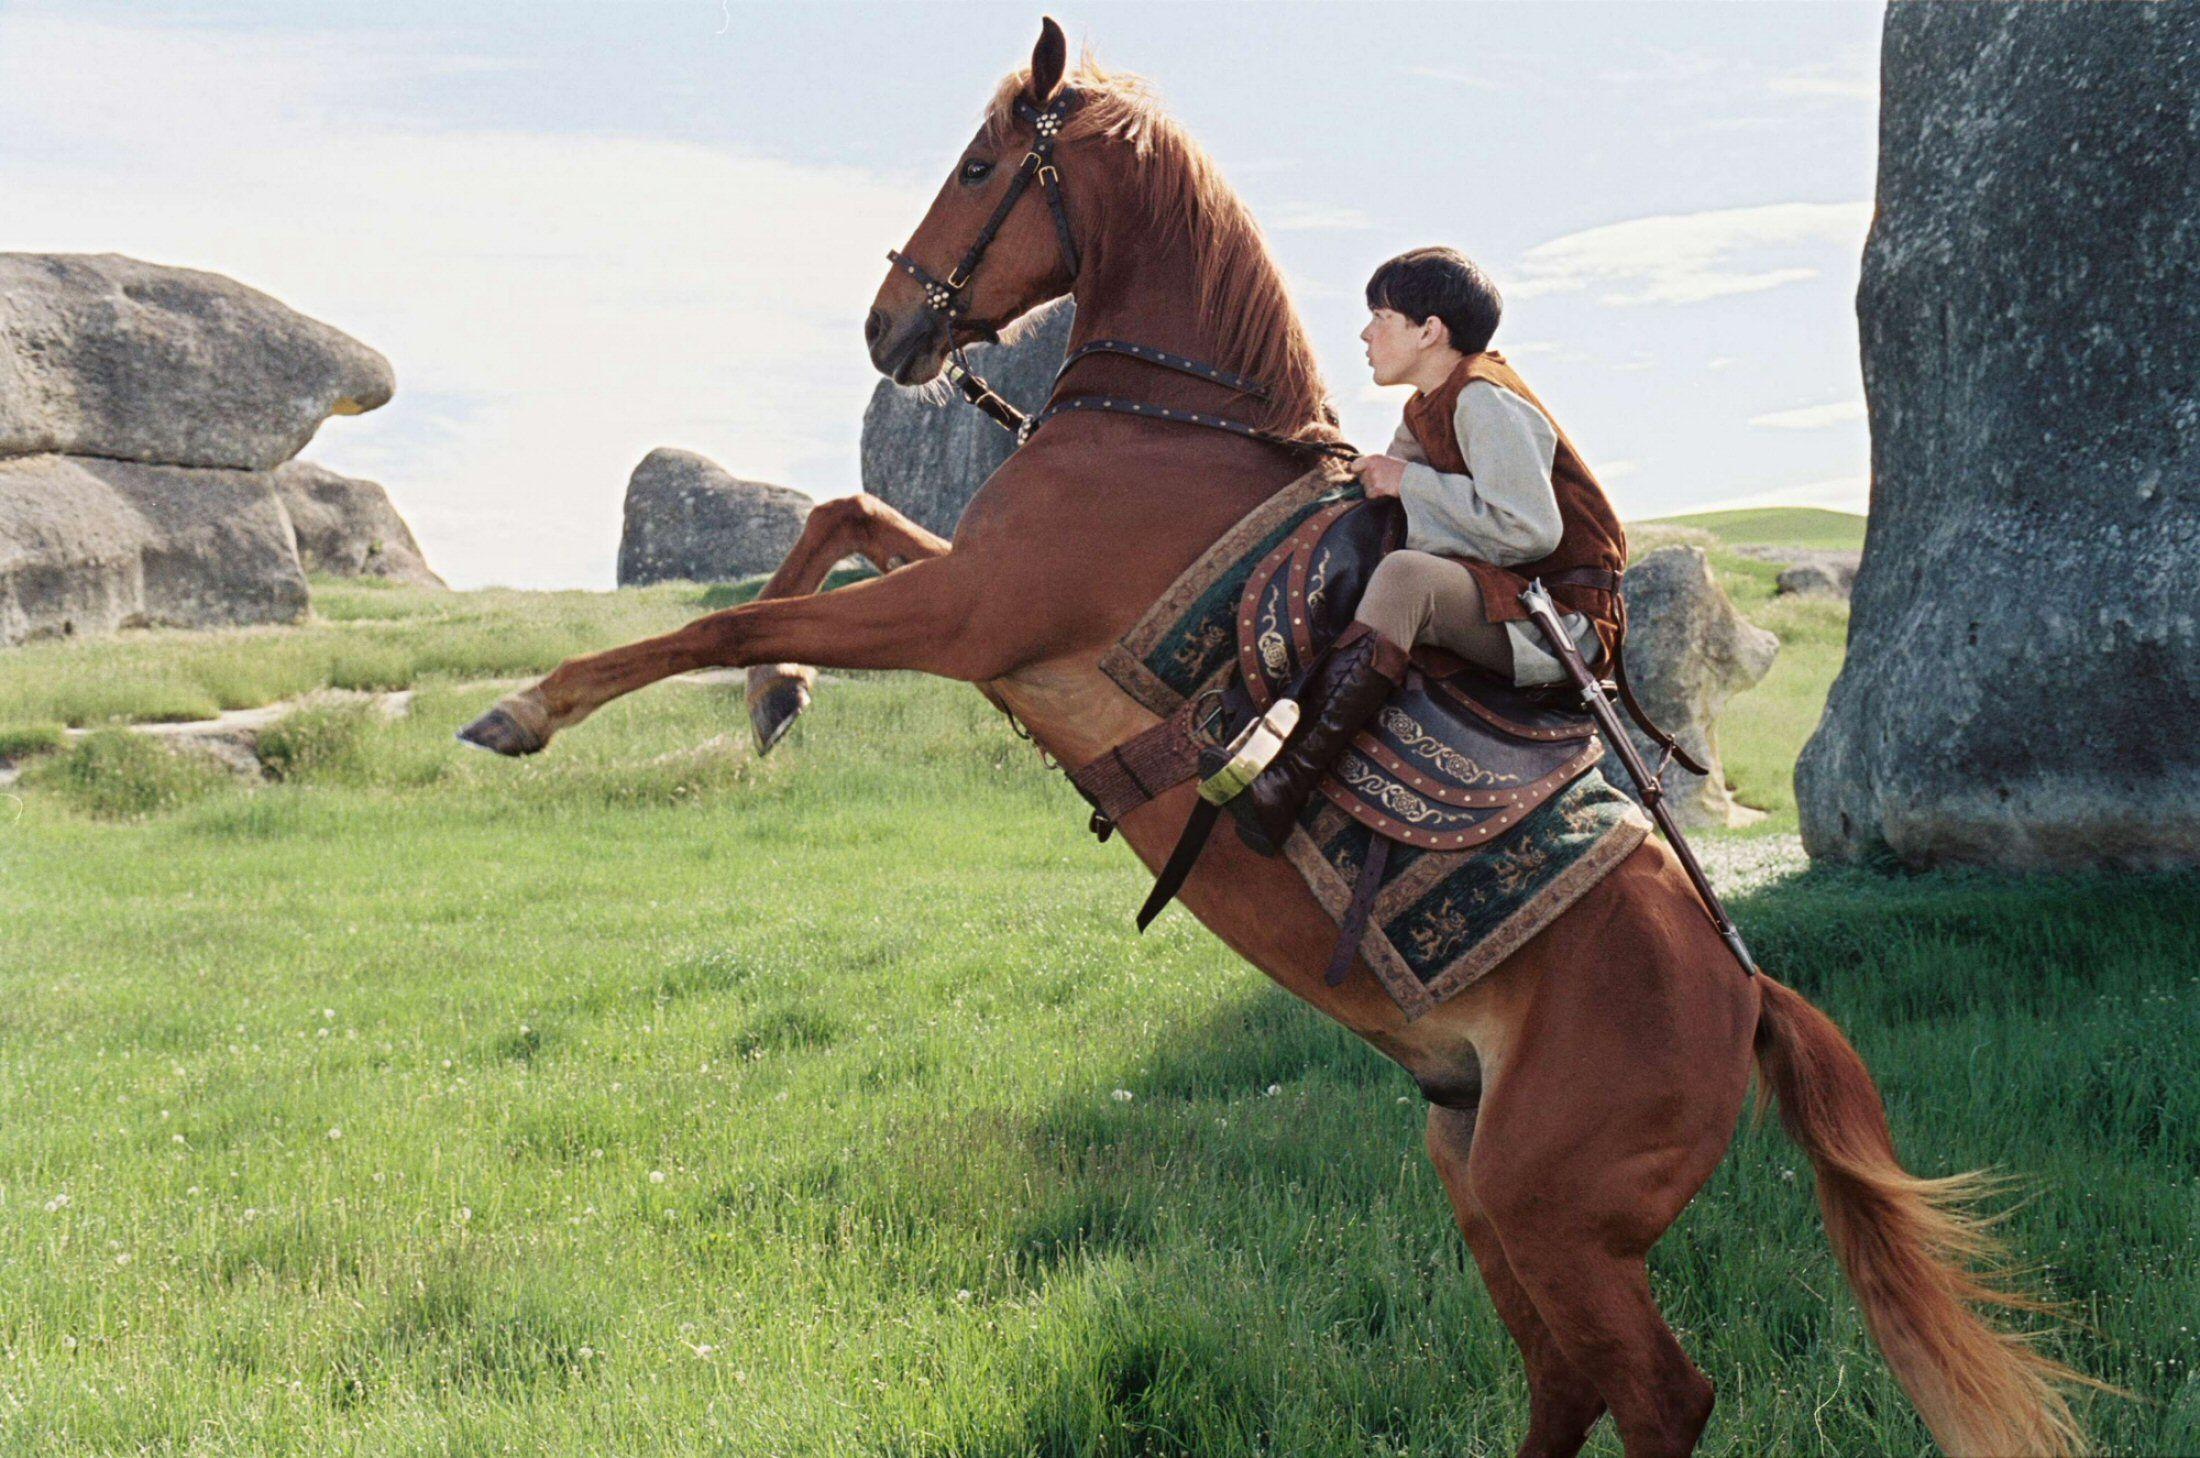 Whooooa horsie!\